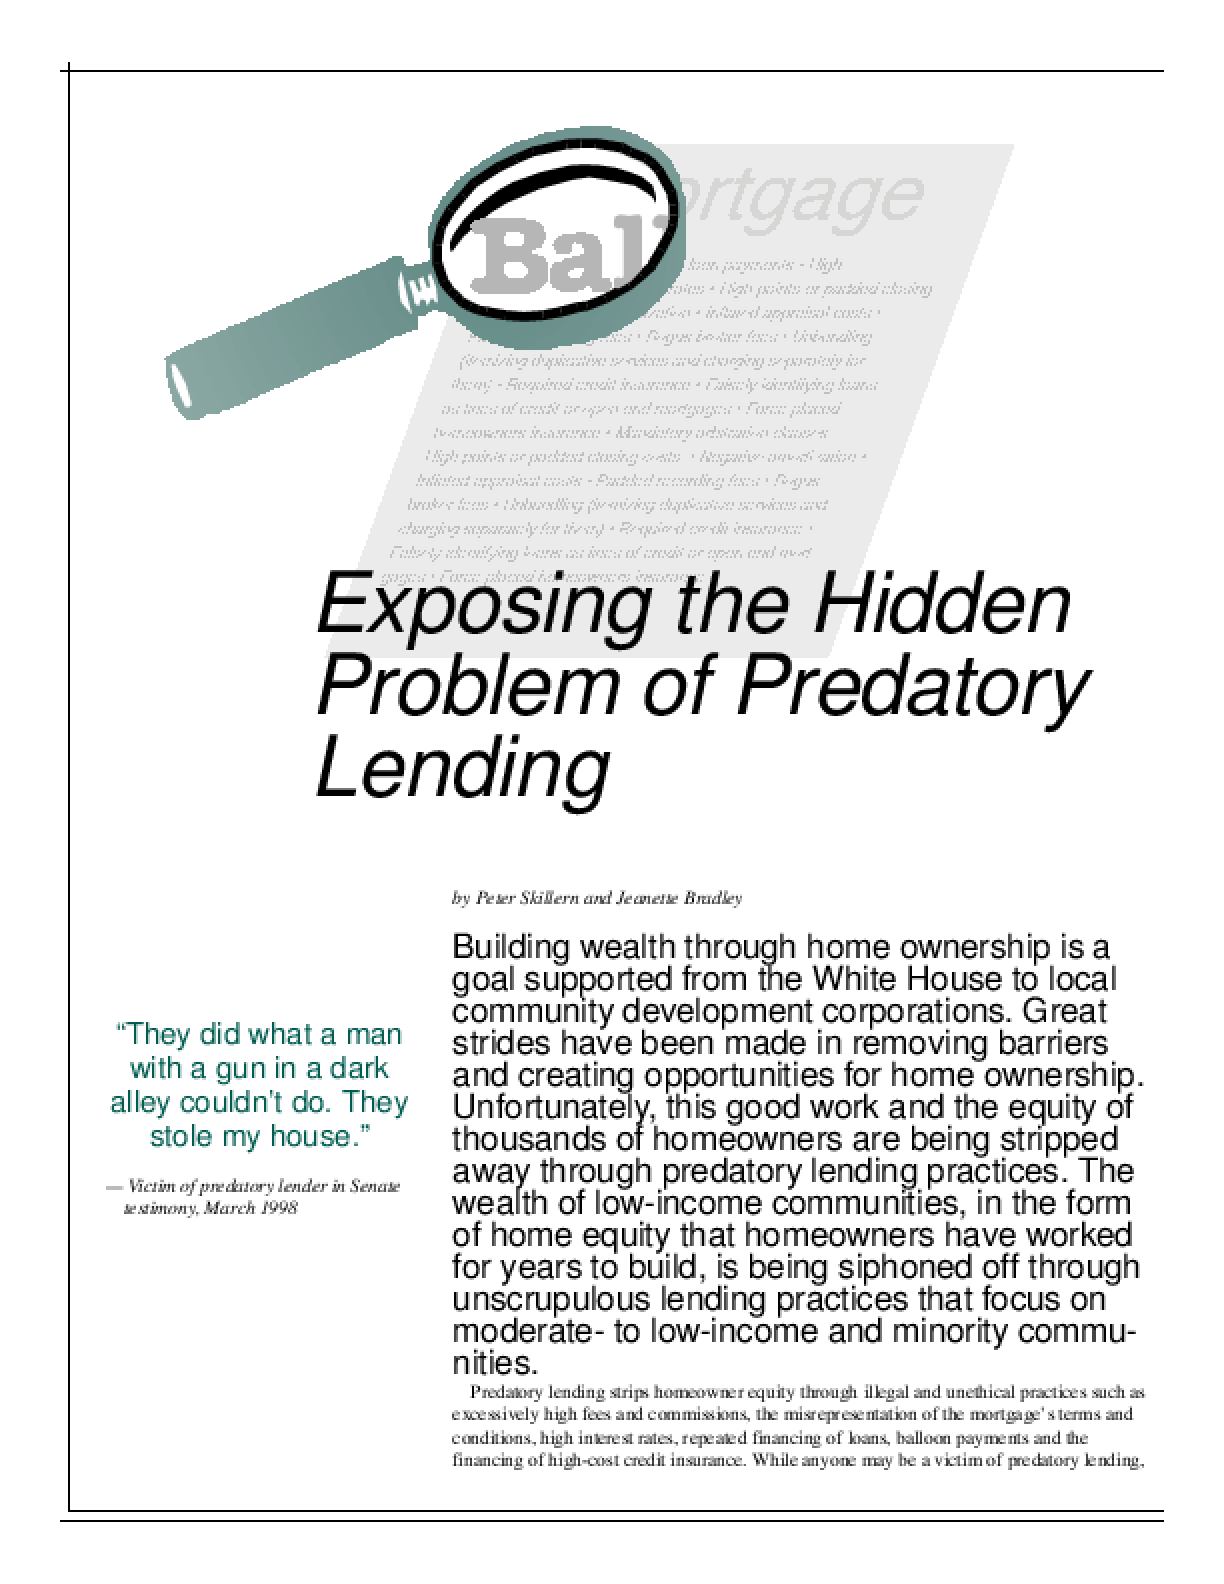 Exposing Predatory Lending - Special Issue of NeighborWorks Journal